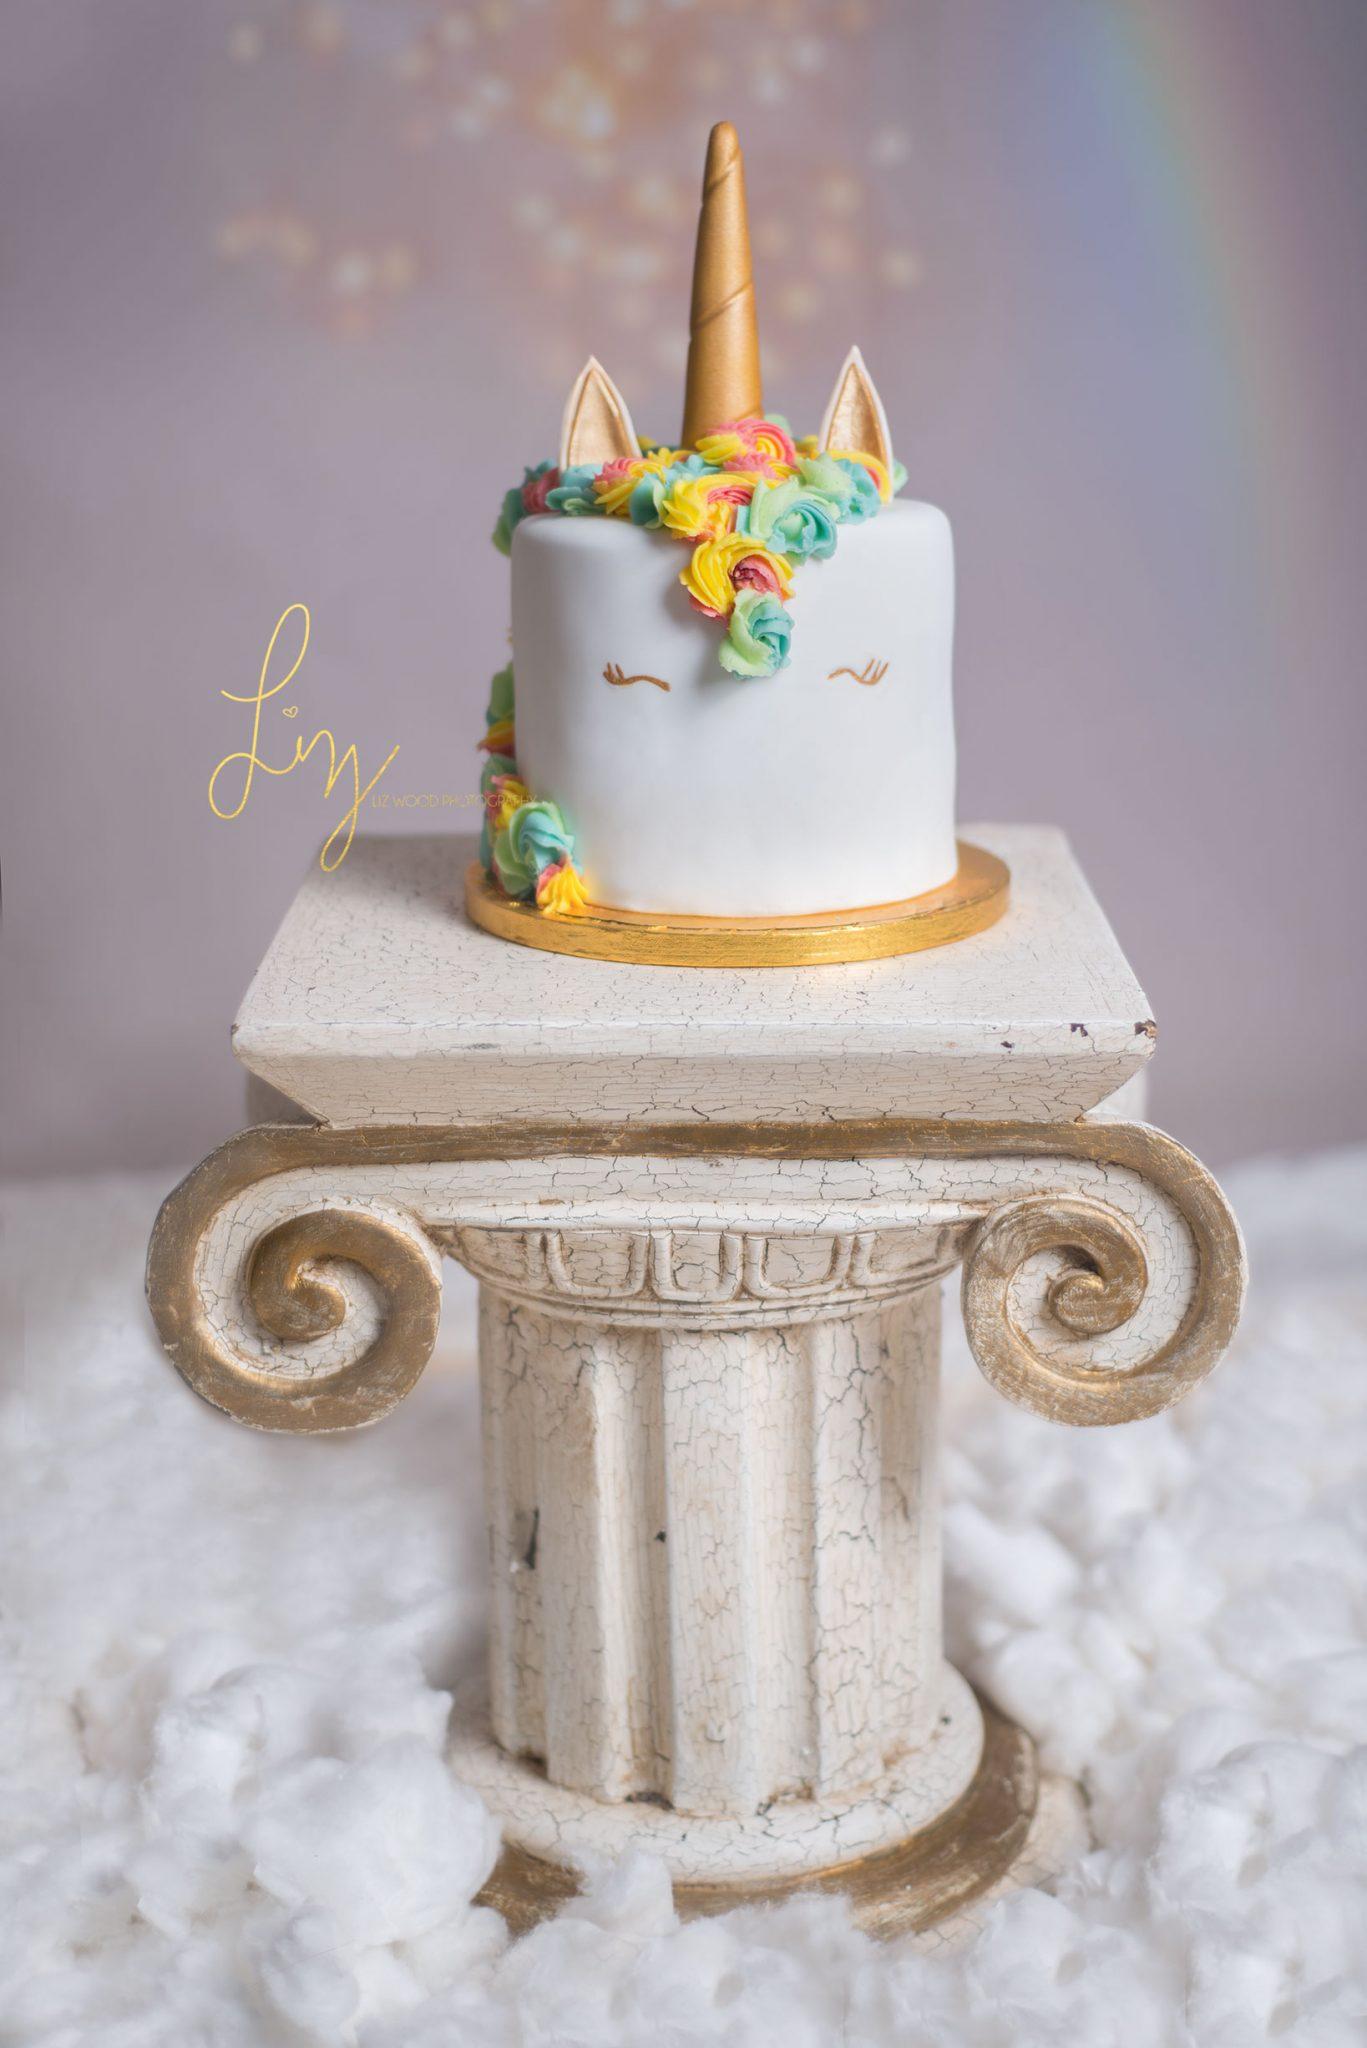 Rainbow cloud unicorn themed Essex cake smash - Liz Wood Photography